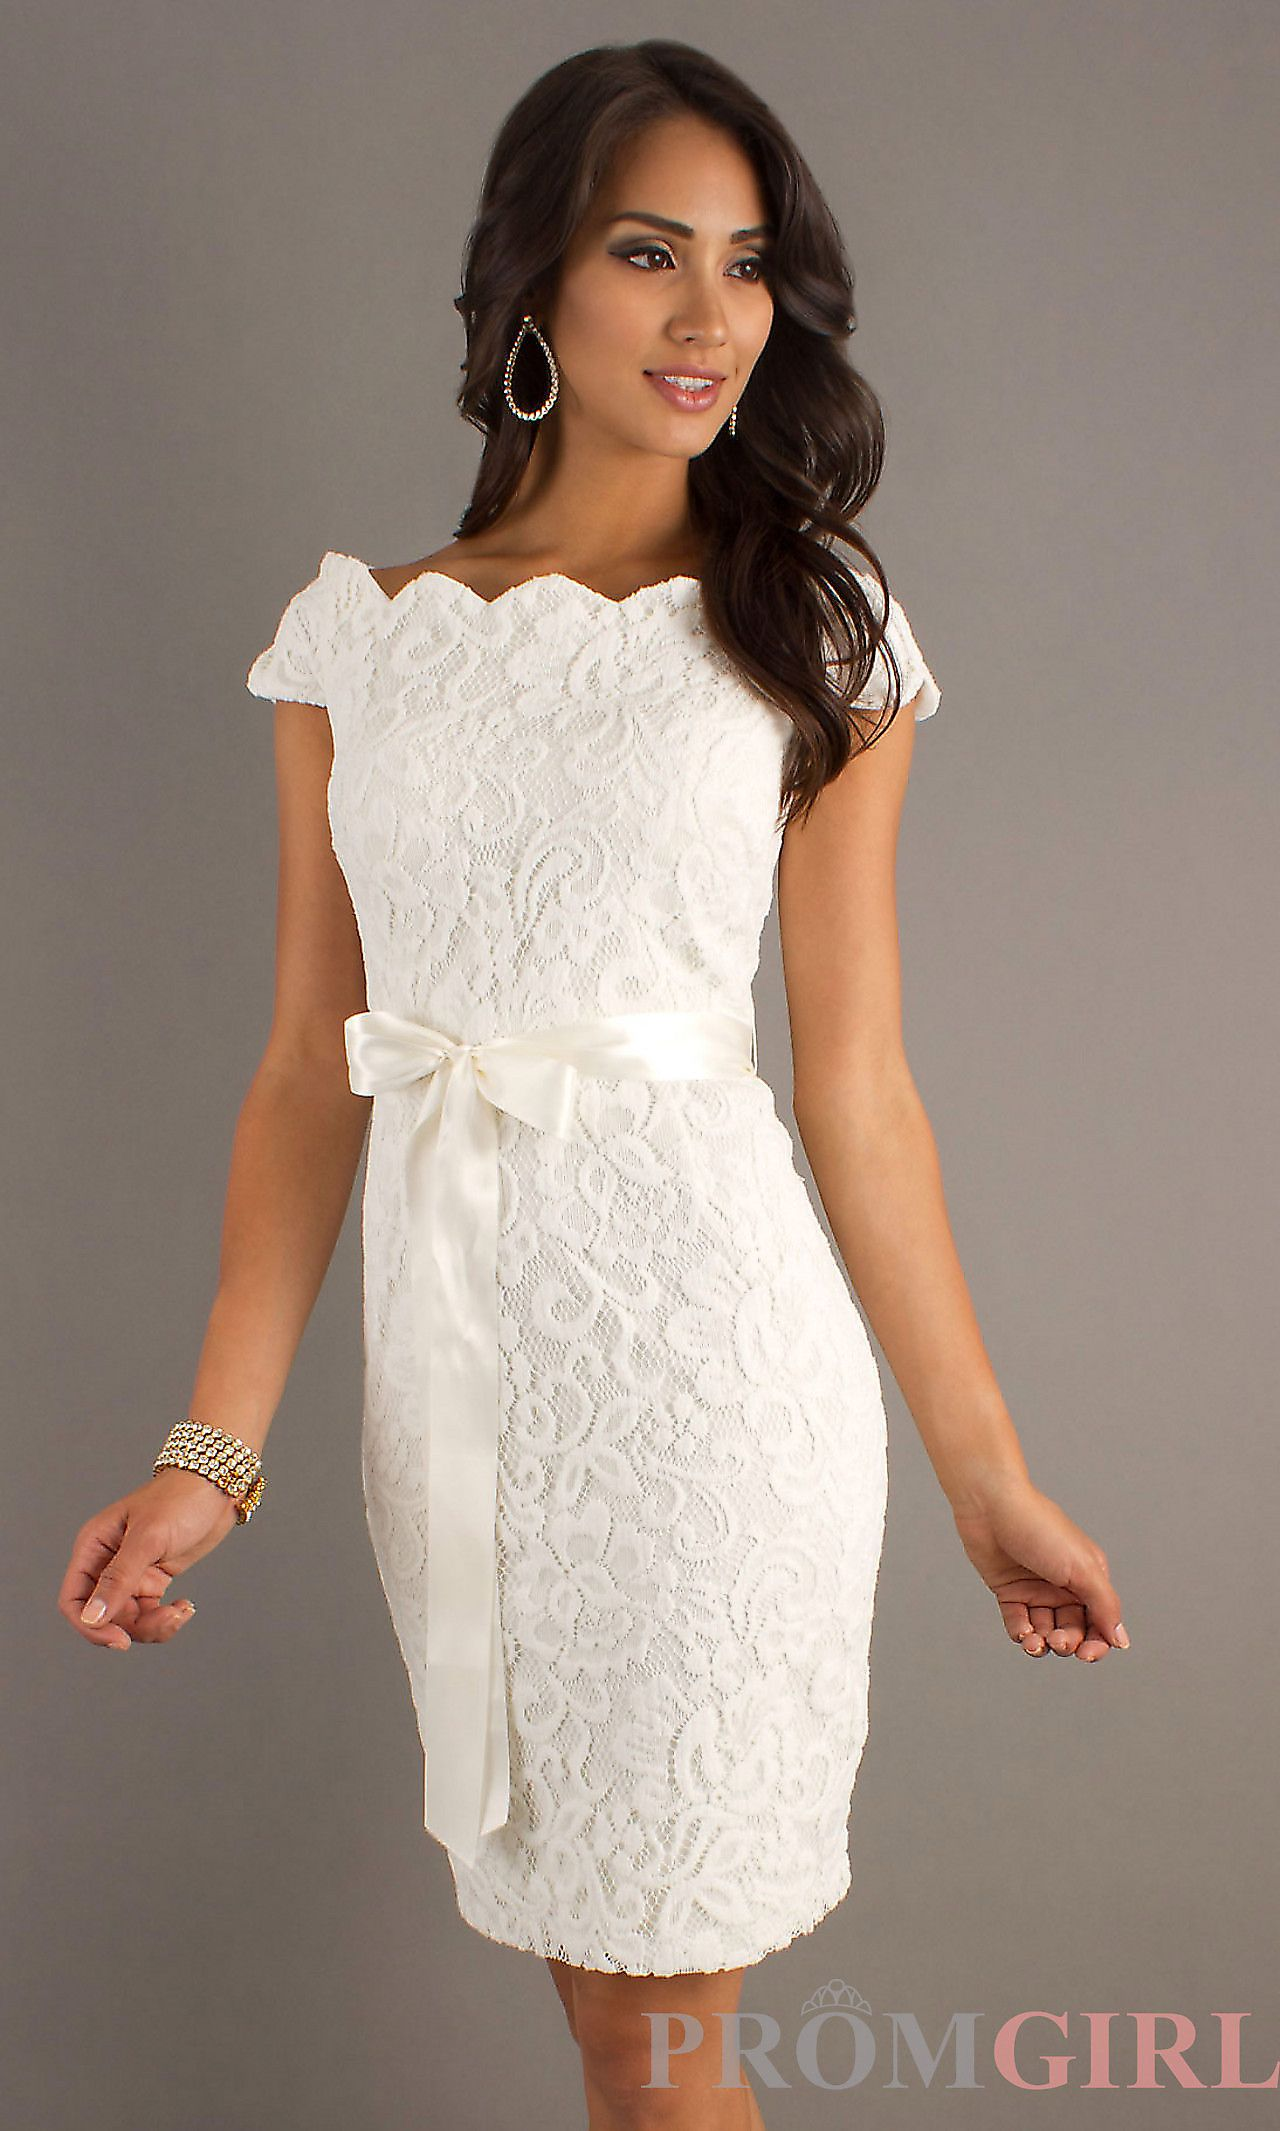 Medium Crop Of White Bridal Shower Dress